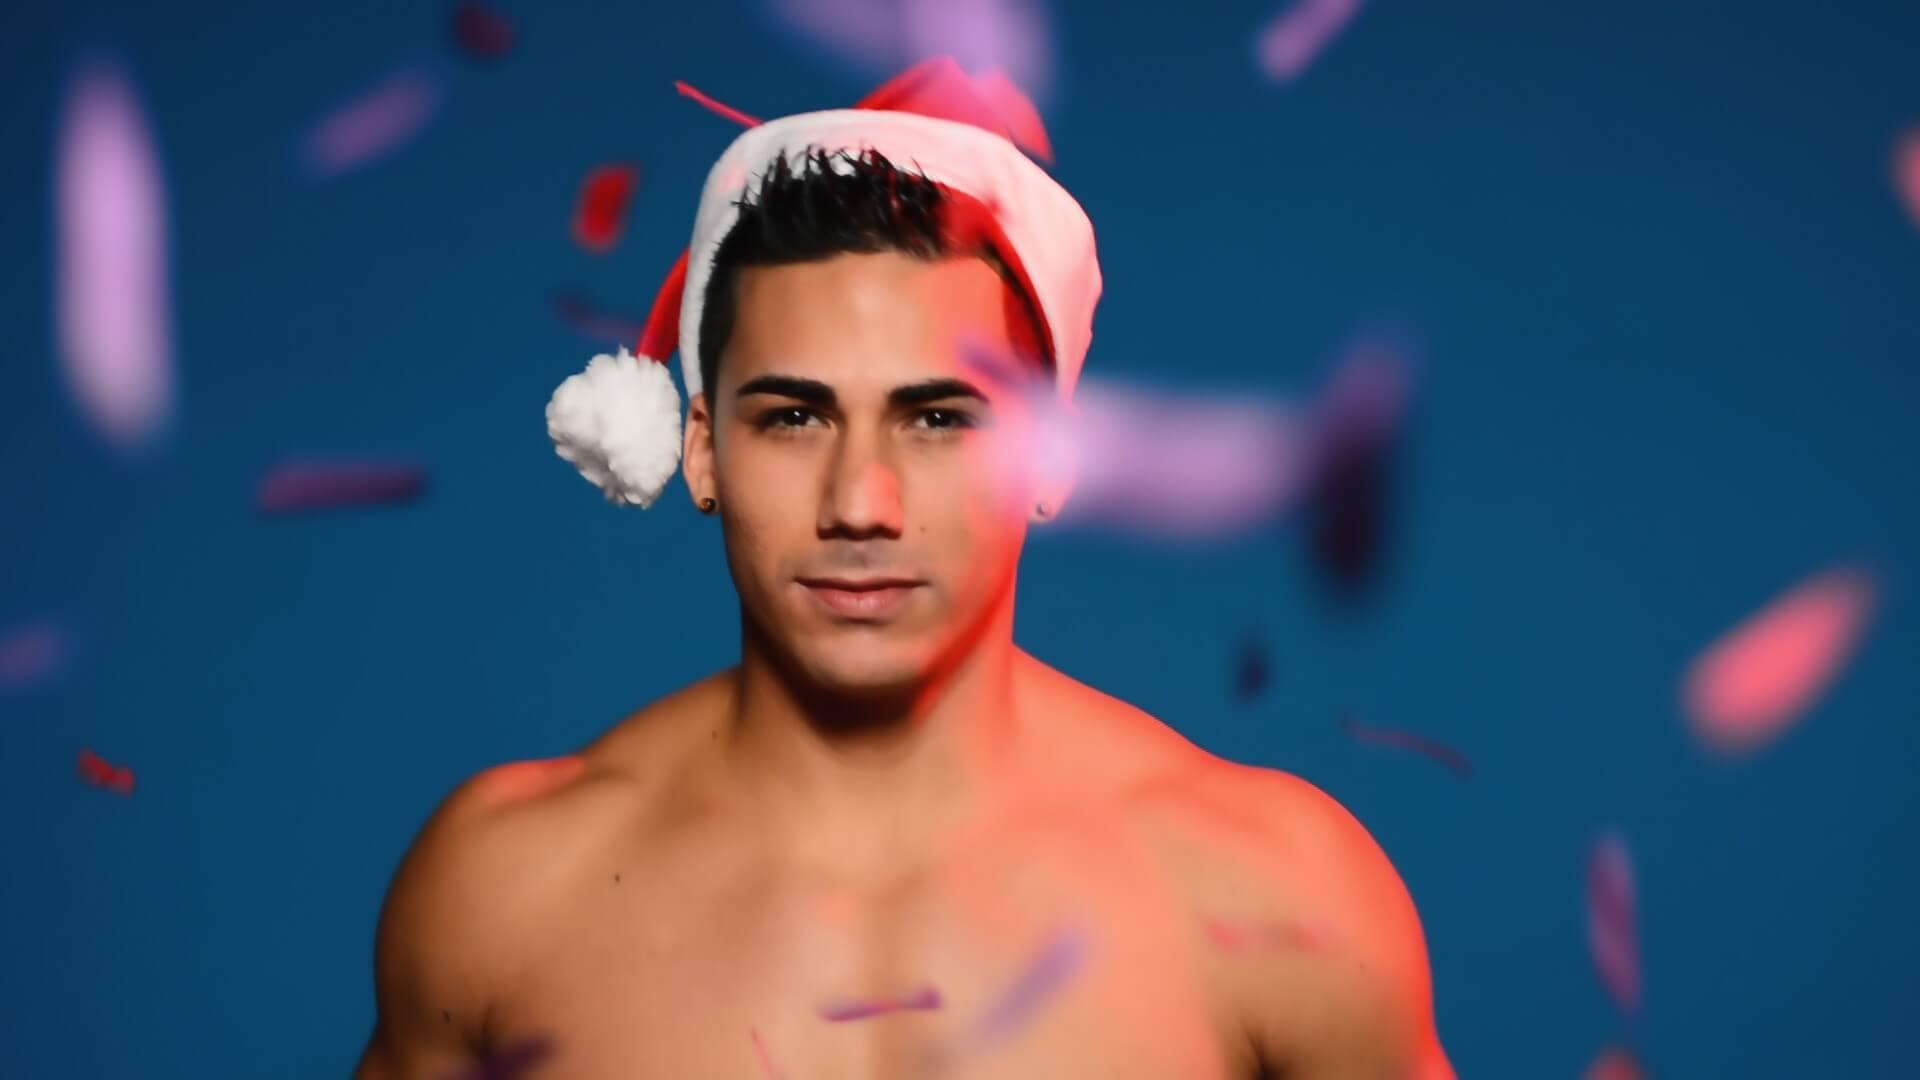 andrew_christian_christmas_holiday_rock